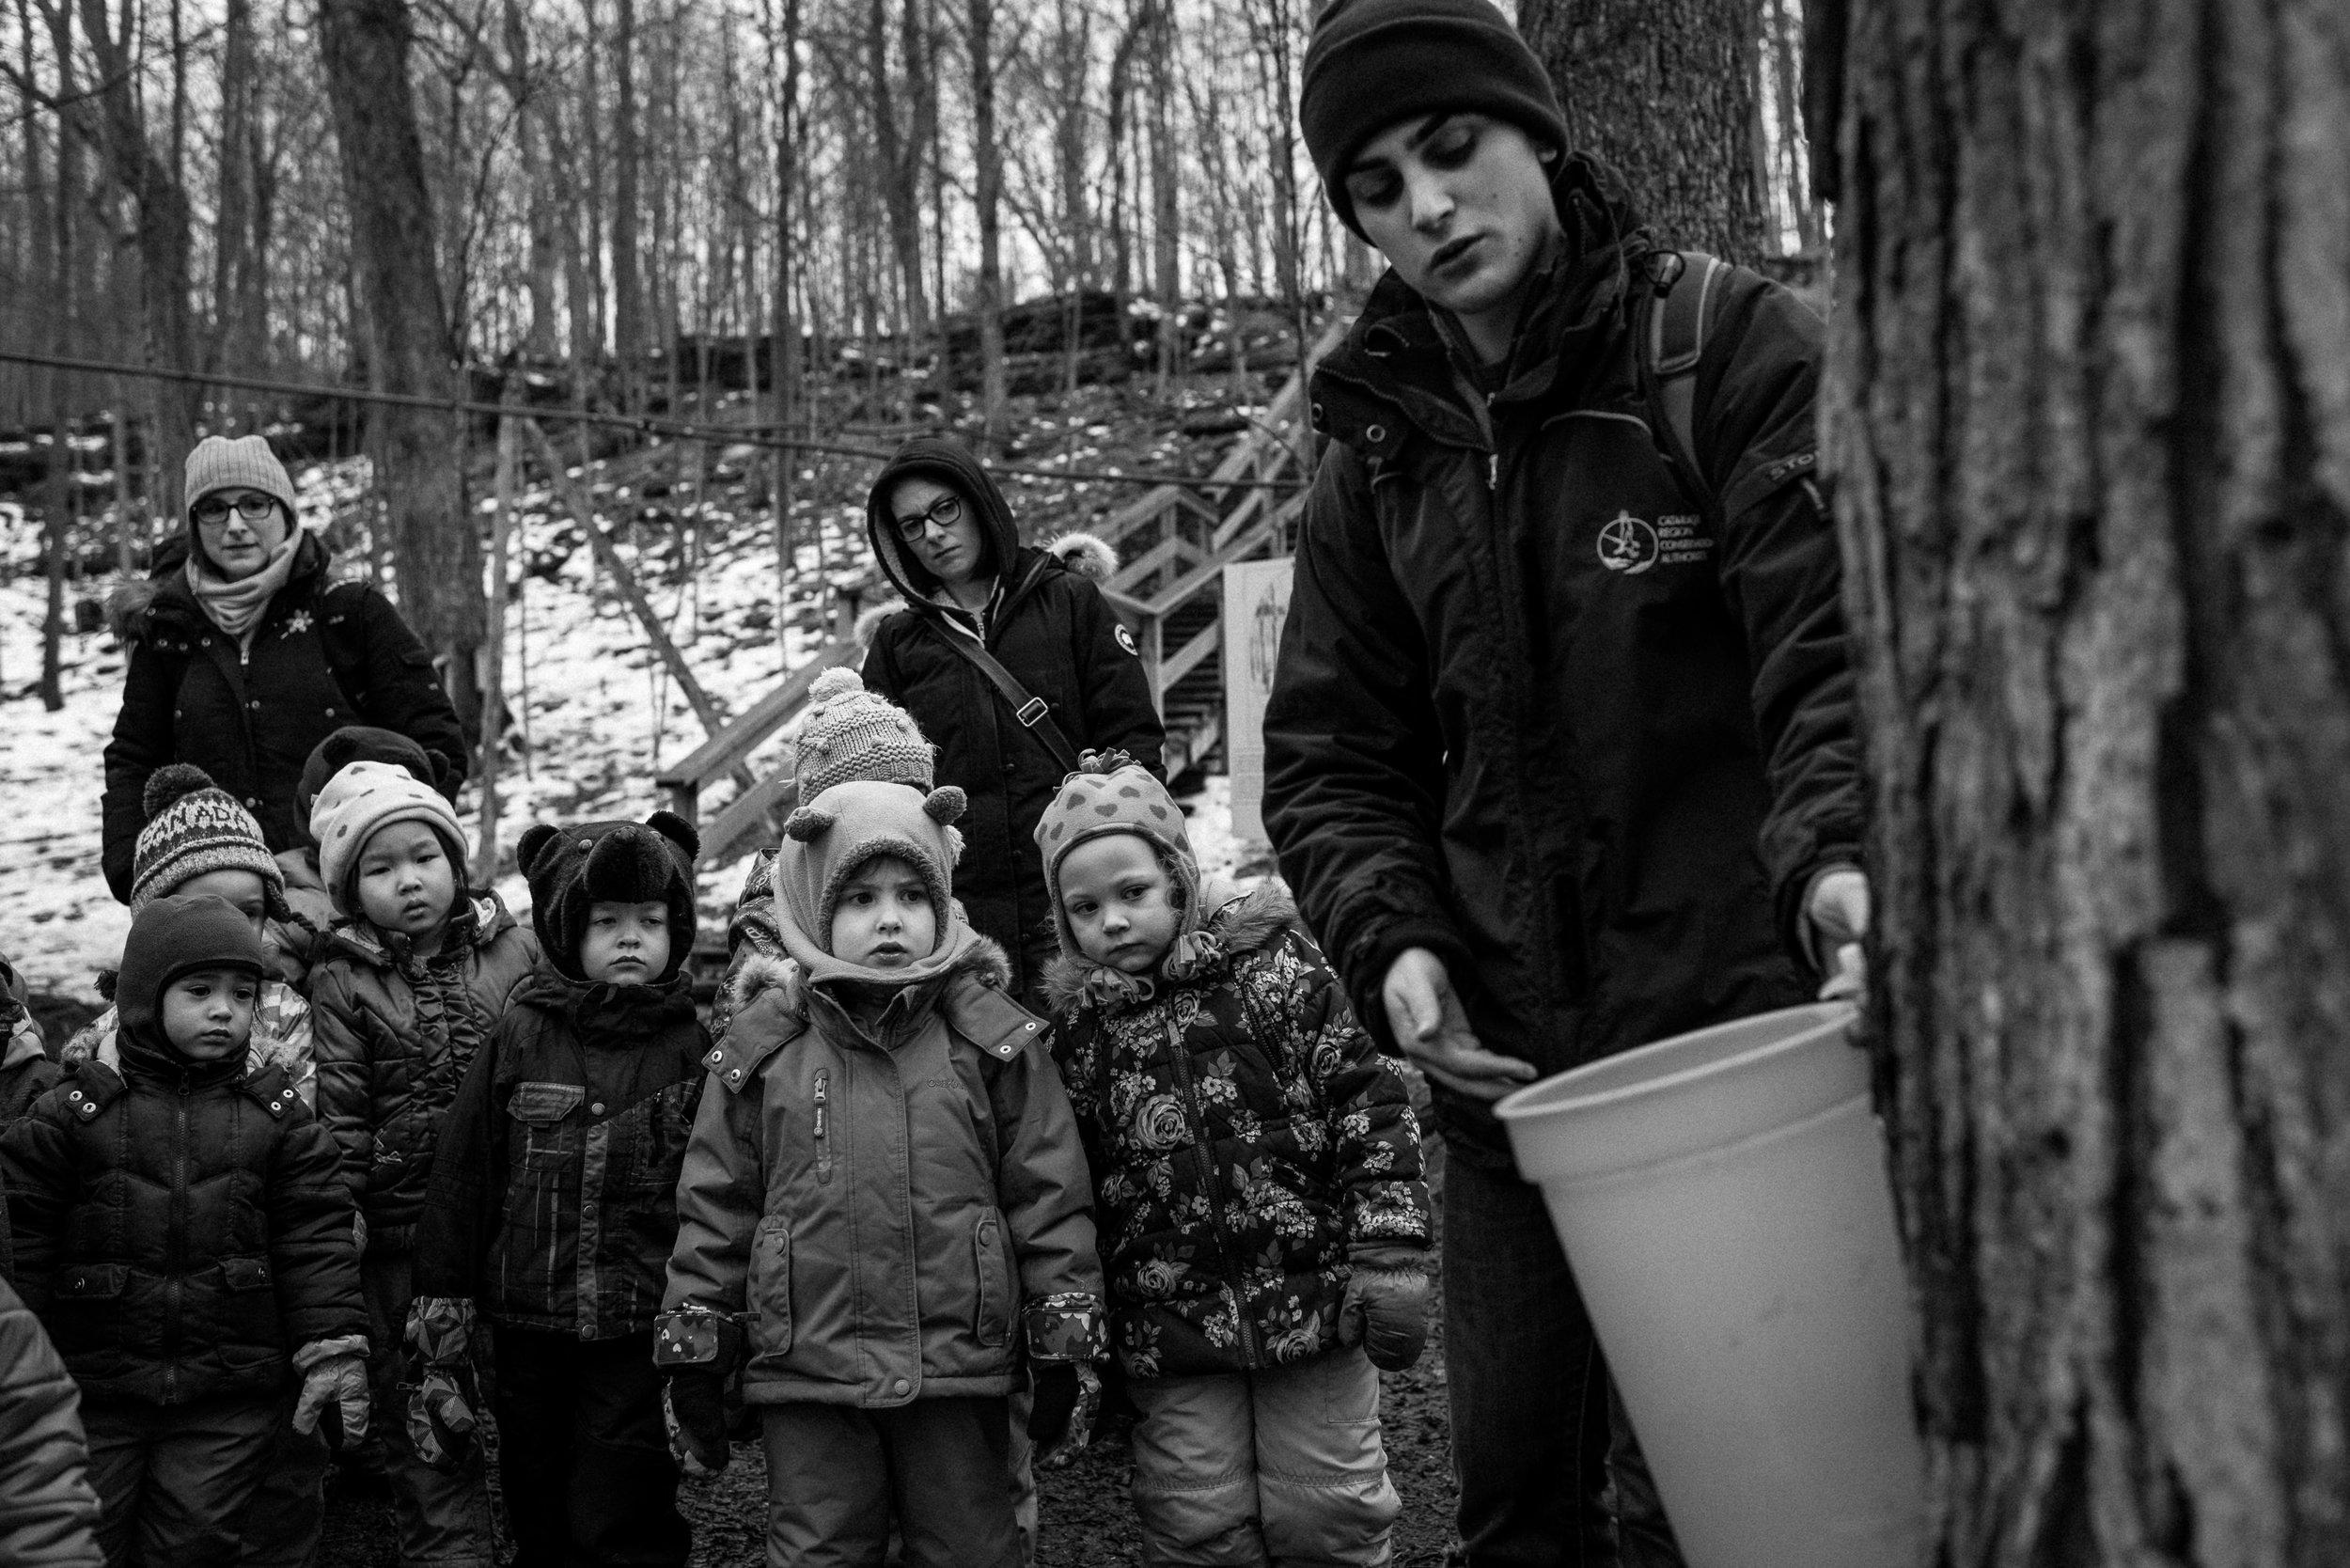 documentary school photography viara mileva kingston toronto ottawa-105610vm.jpg